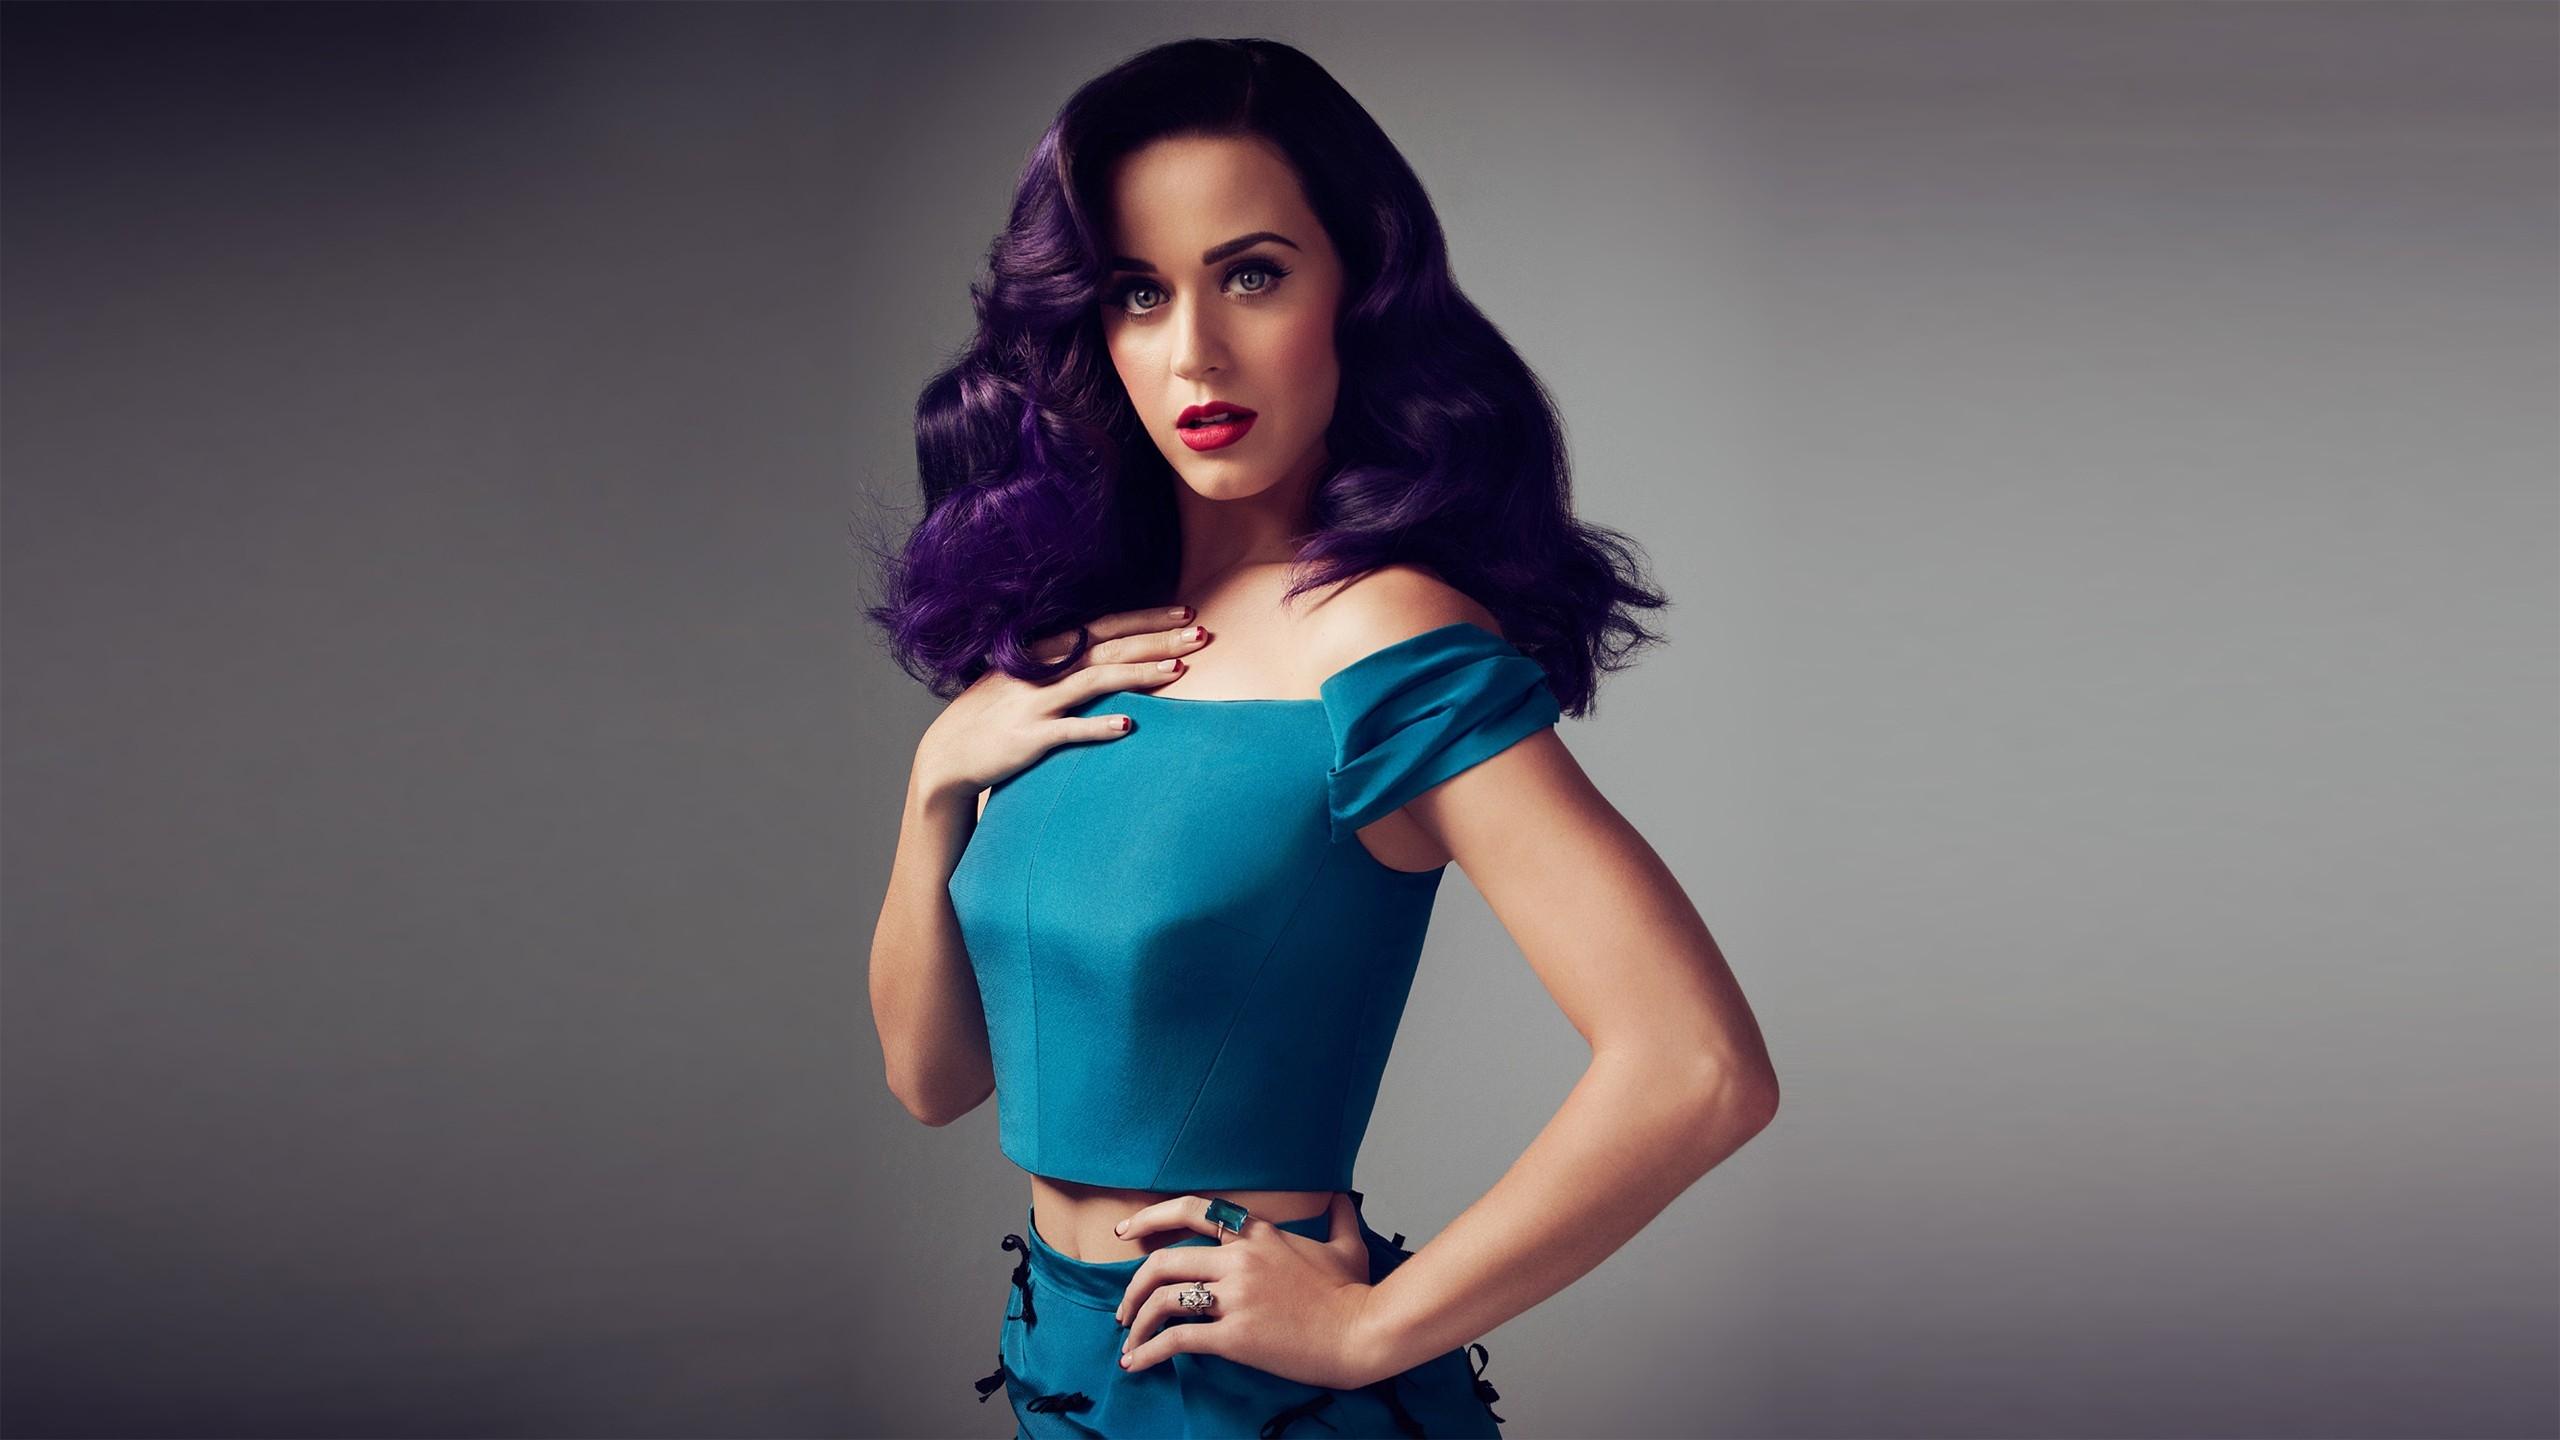 Katy Perry International Smile Listen